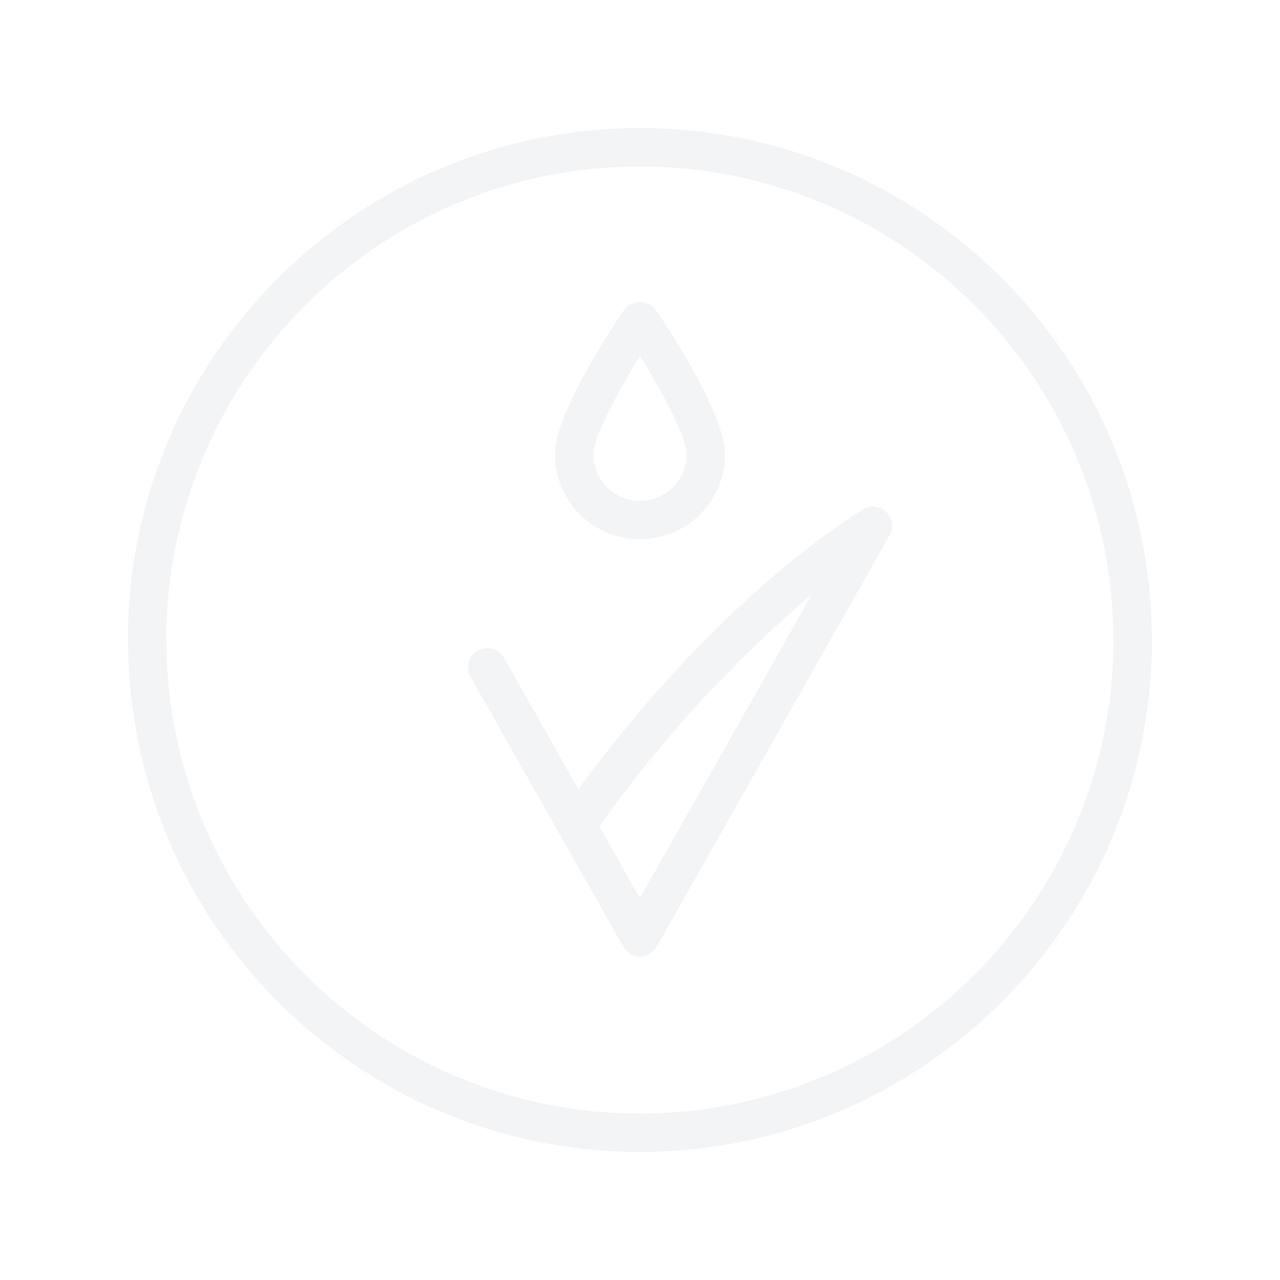 HUGO BOSS Ma Vie Pour Femme 50ml Eau De Parfum Комплект